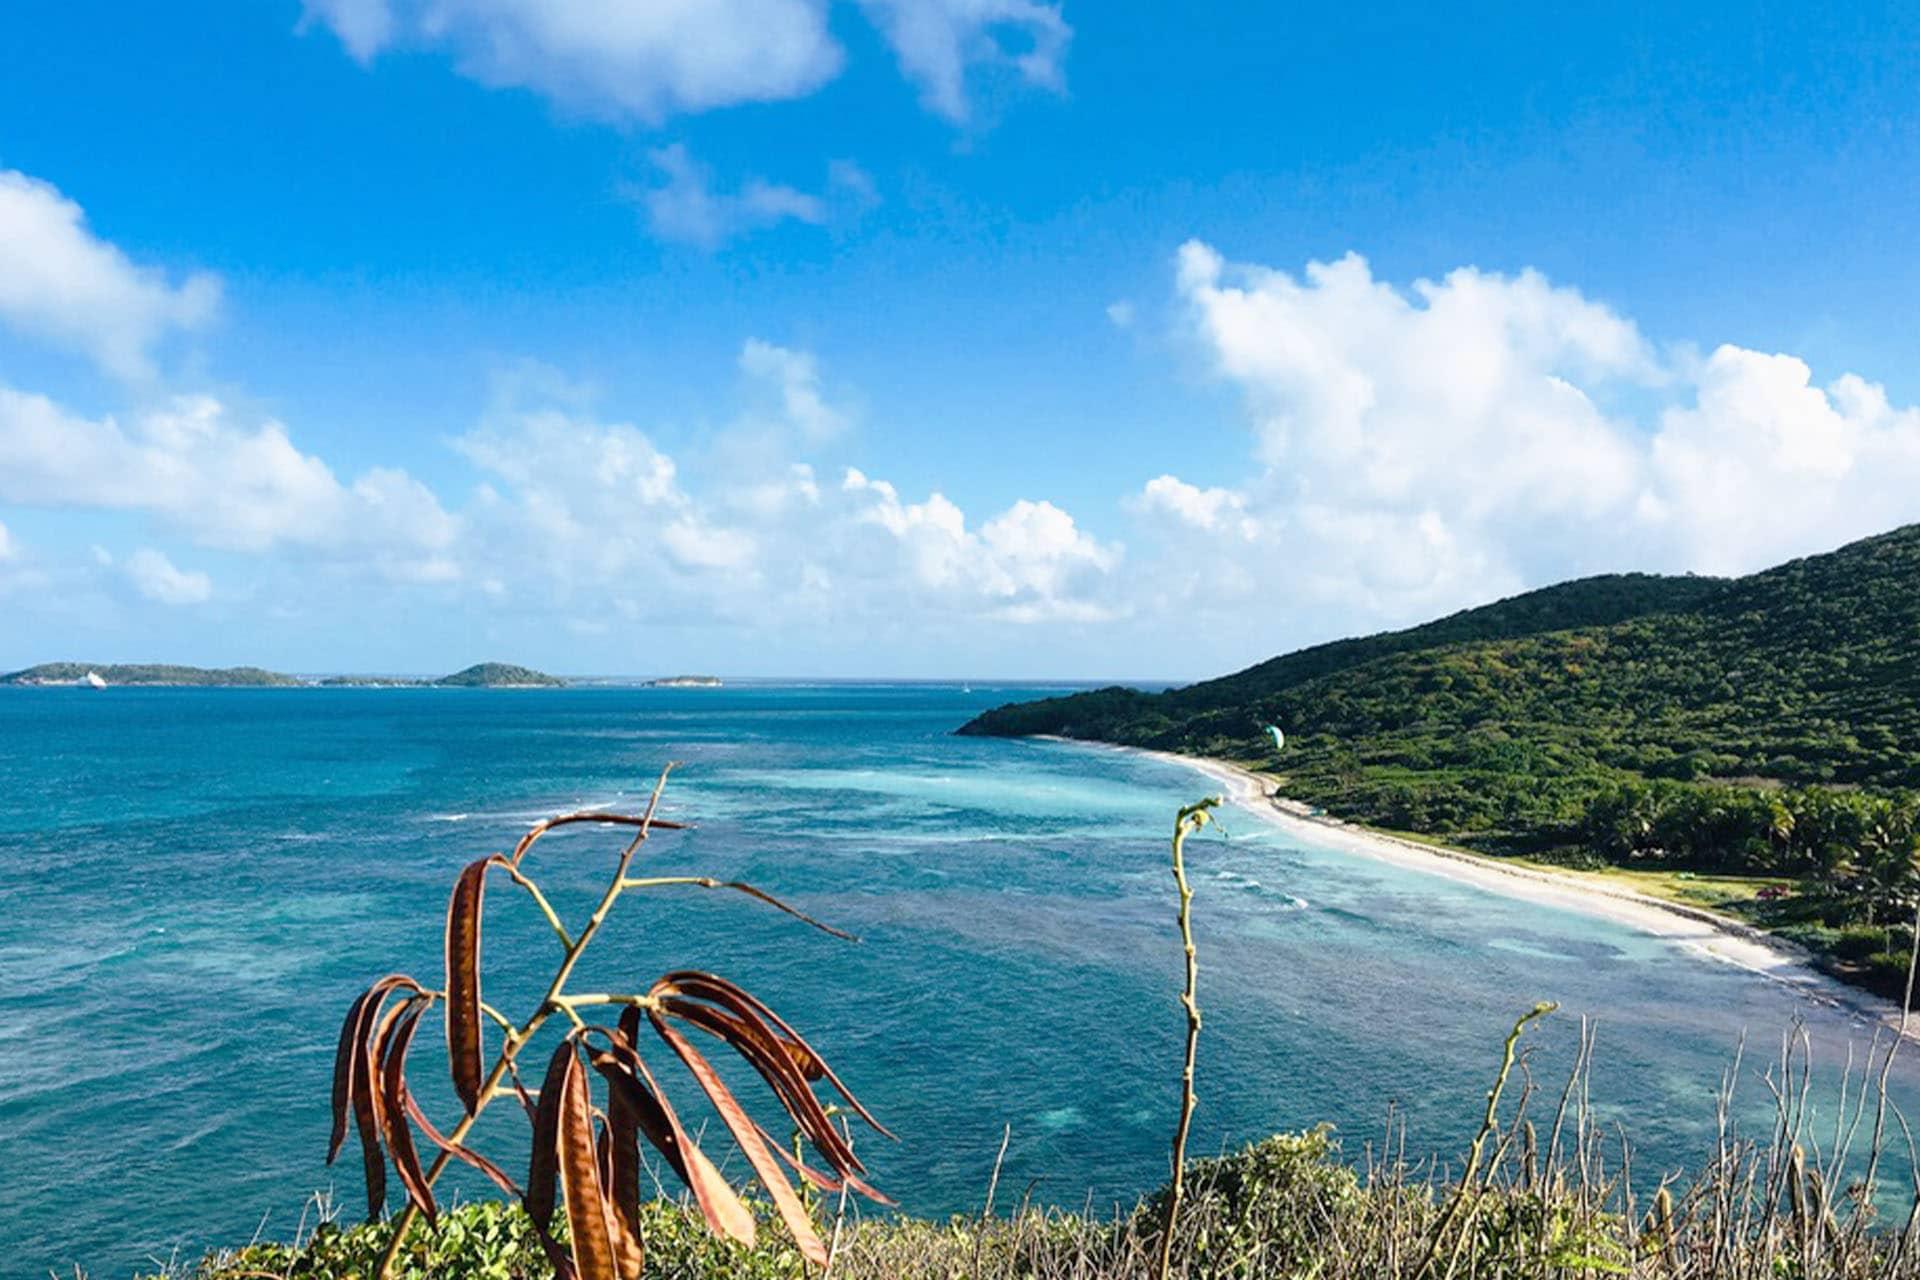 Caribbean island view